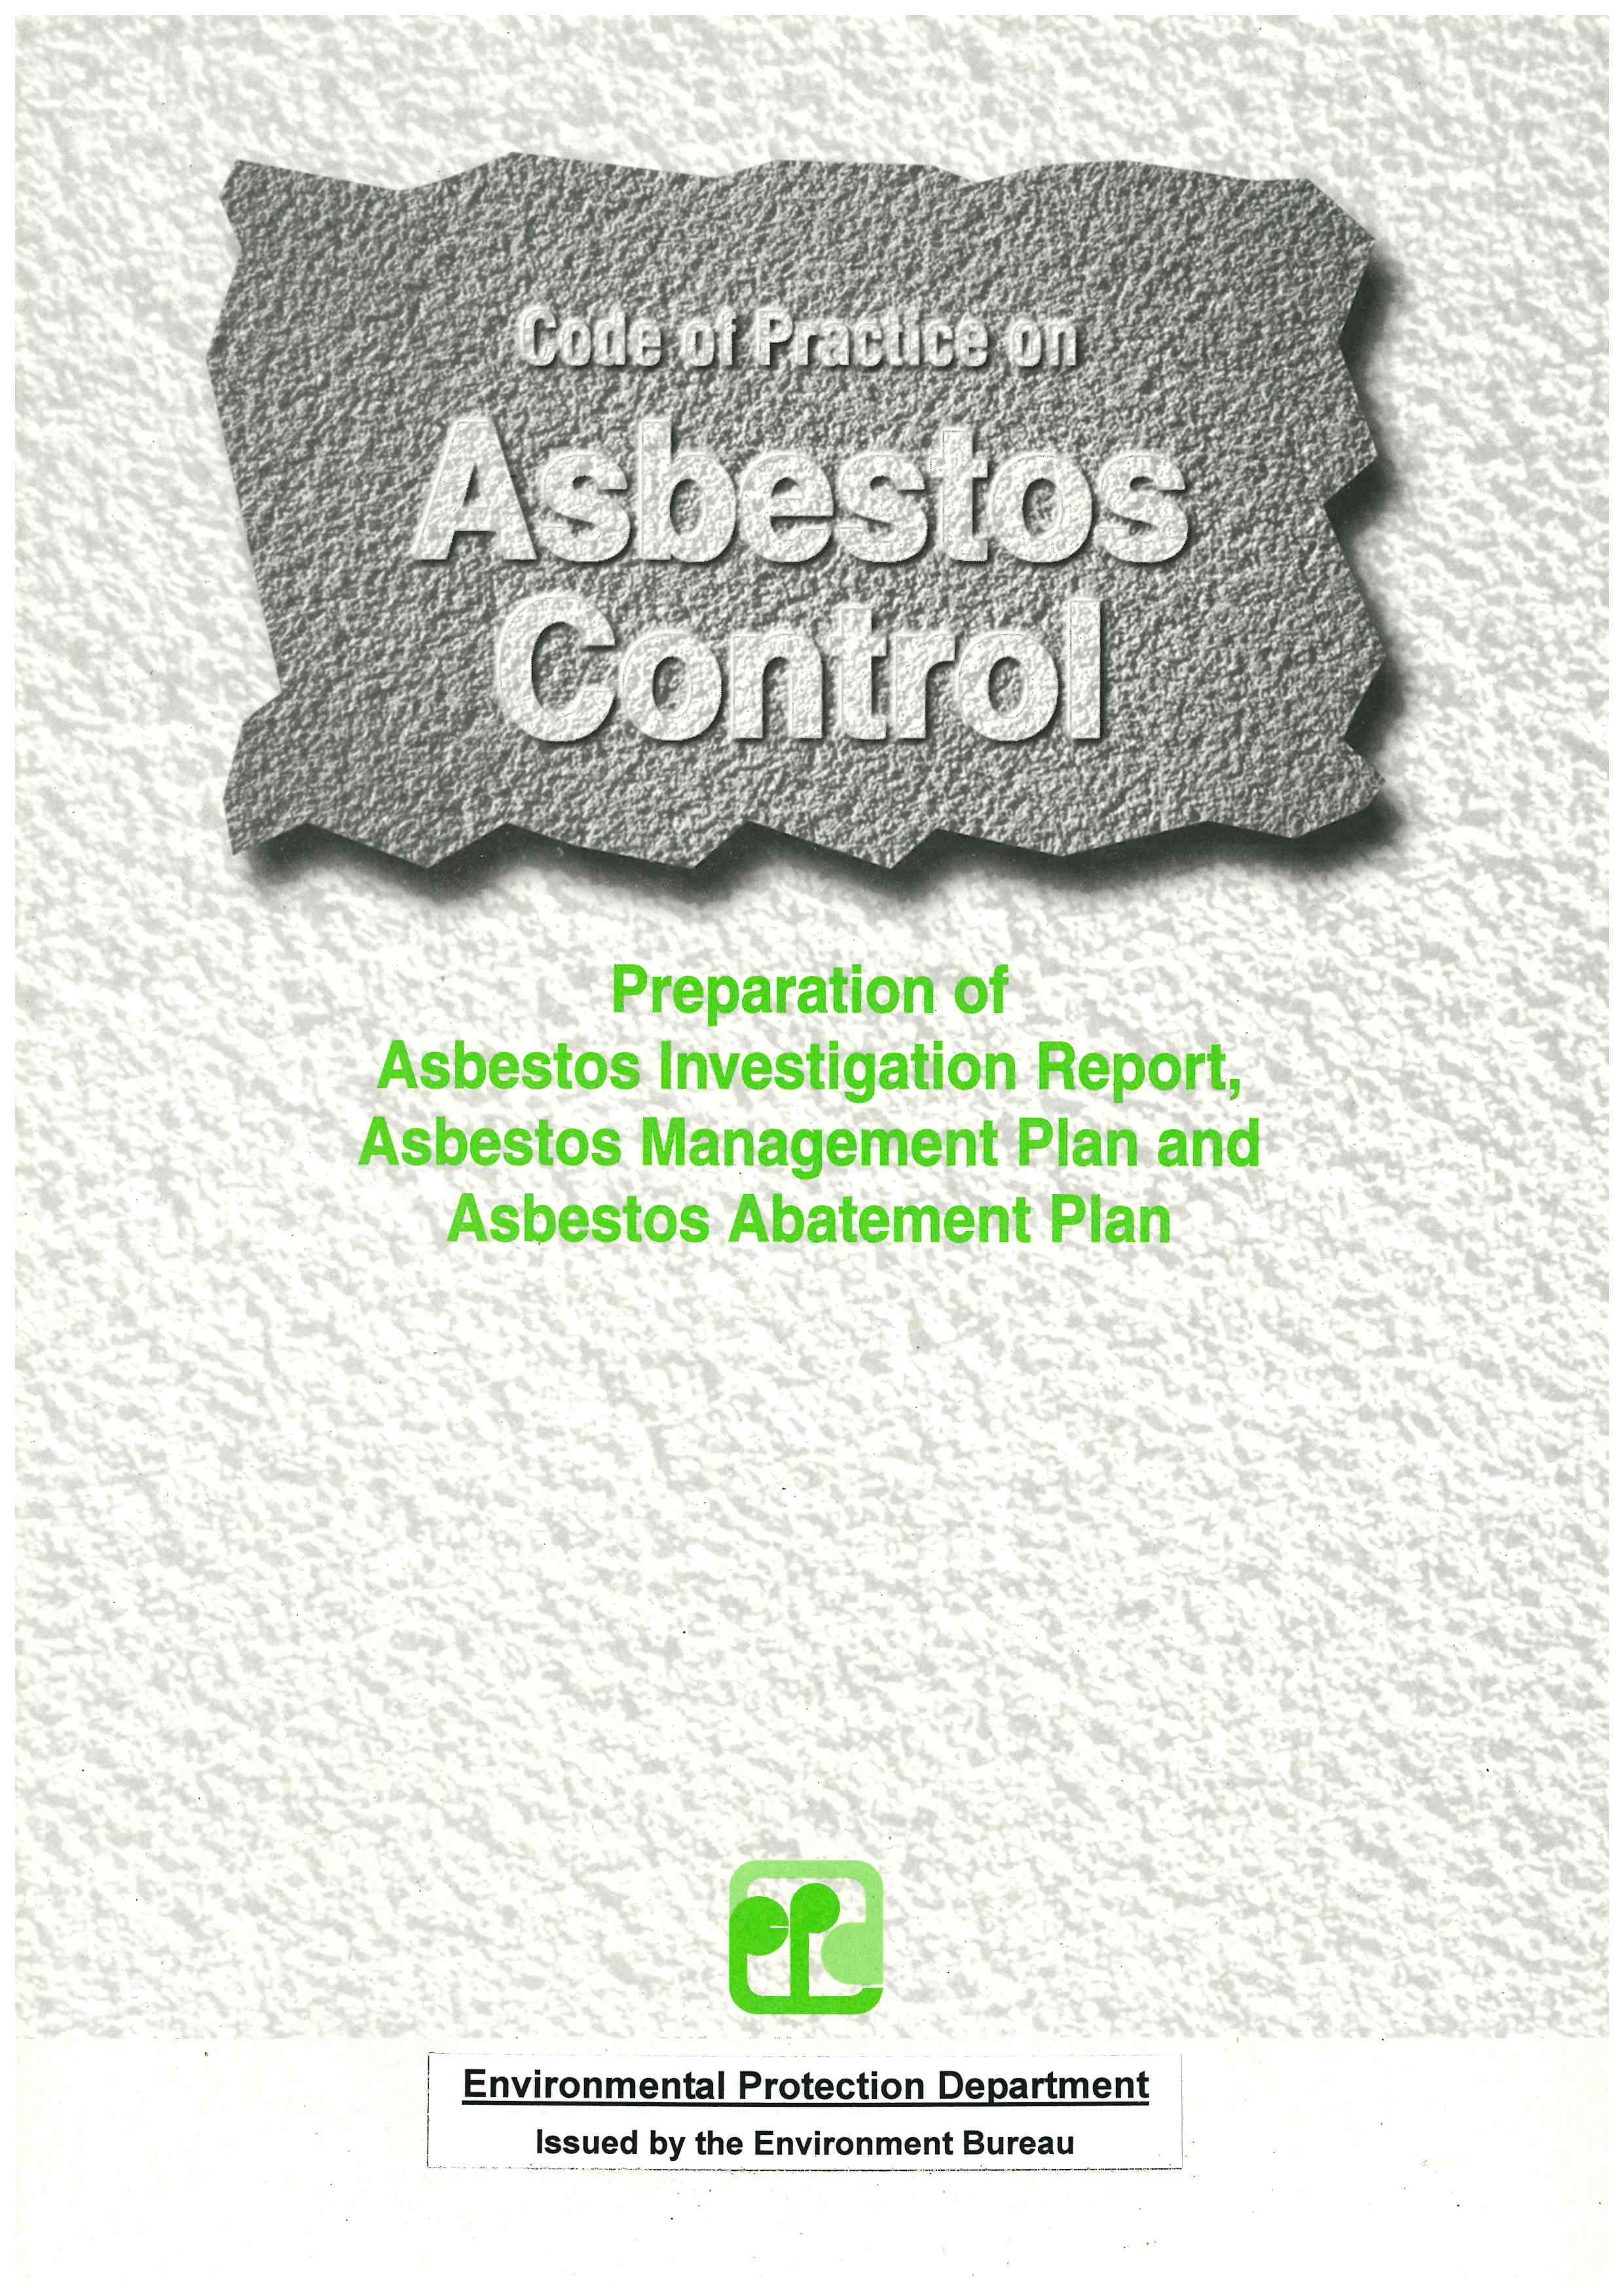 Asbestos Control Environmental Protection Department